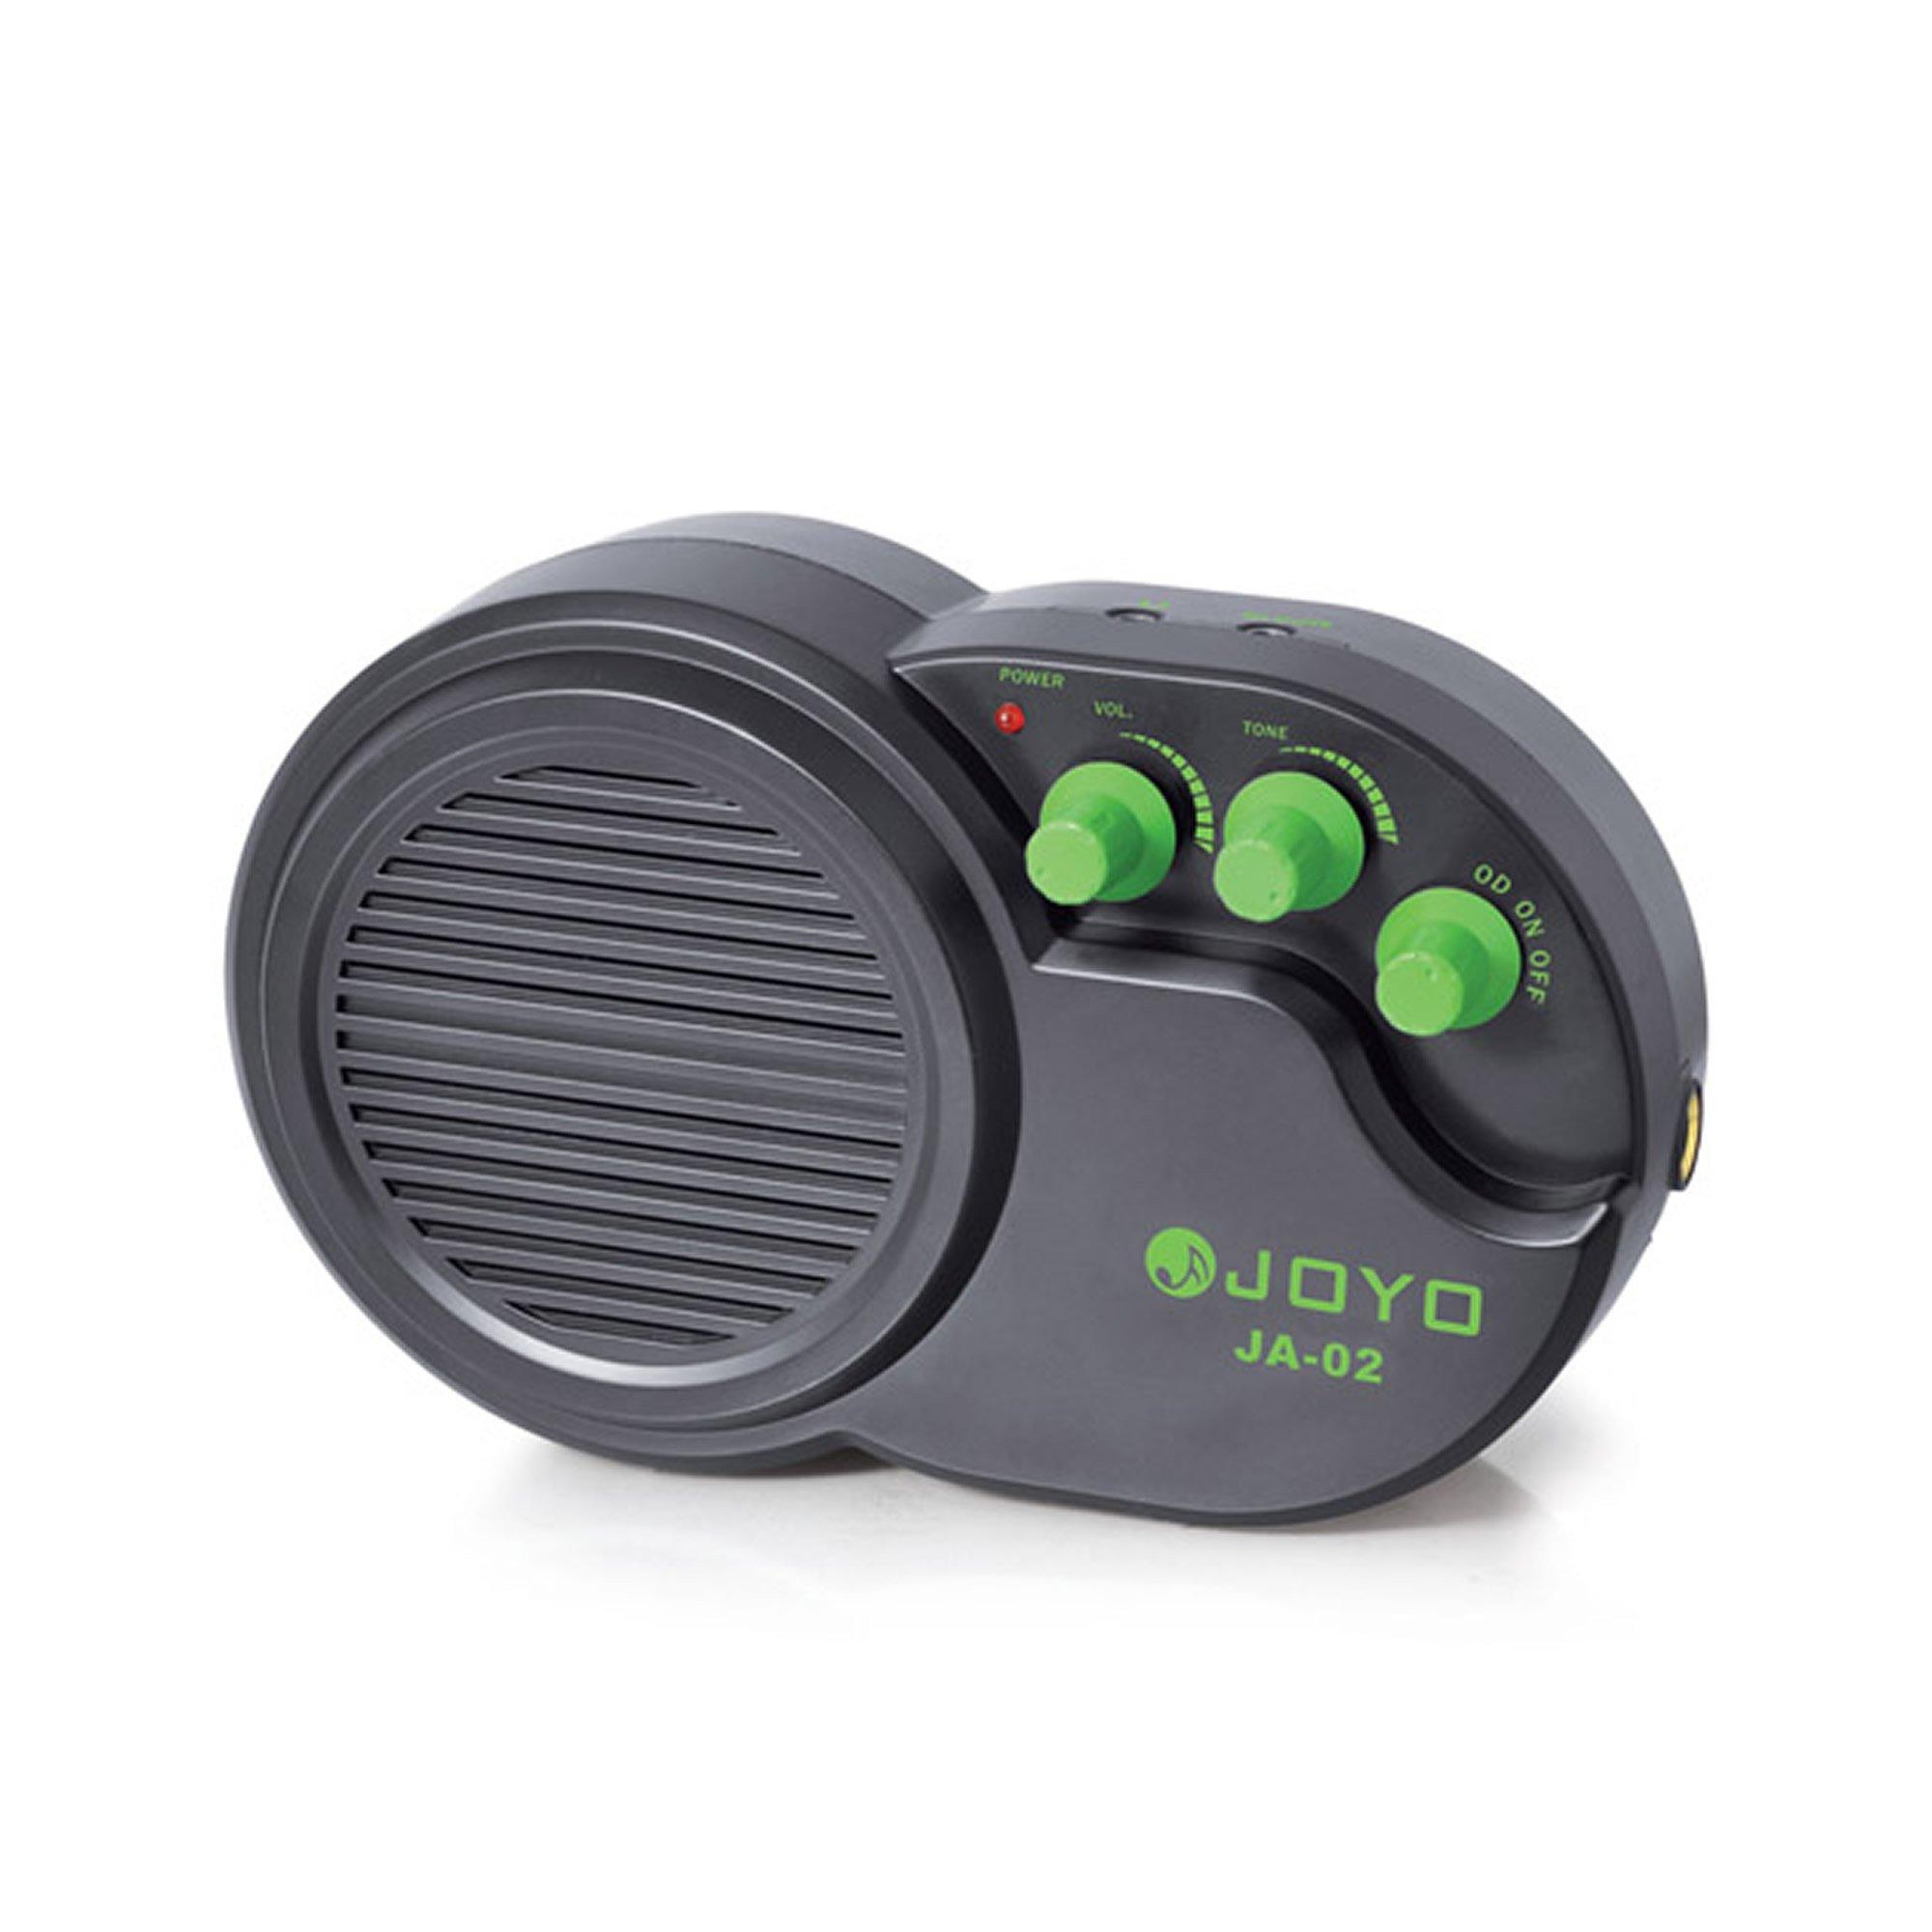 JOYO JA-02 3W Mini Electric Guitar Amp Amplifier Speaker with Volume Tone Distortion Control